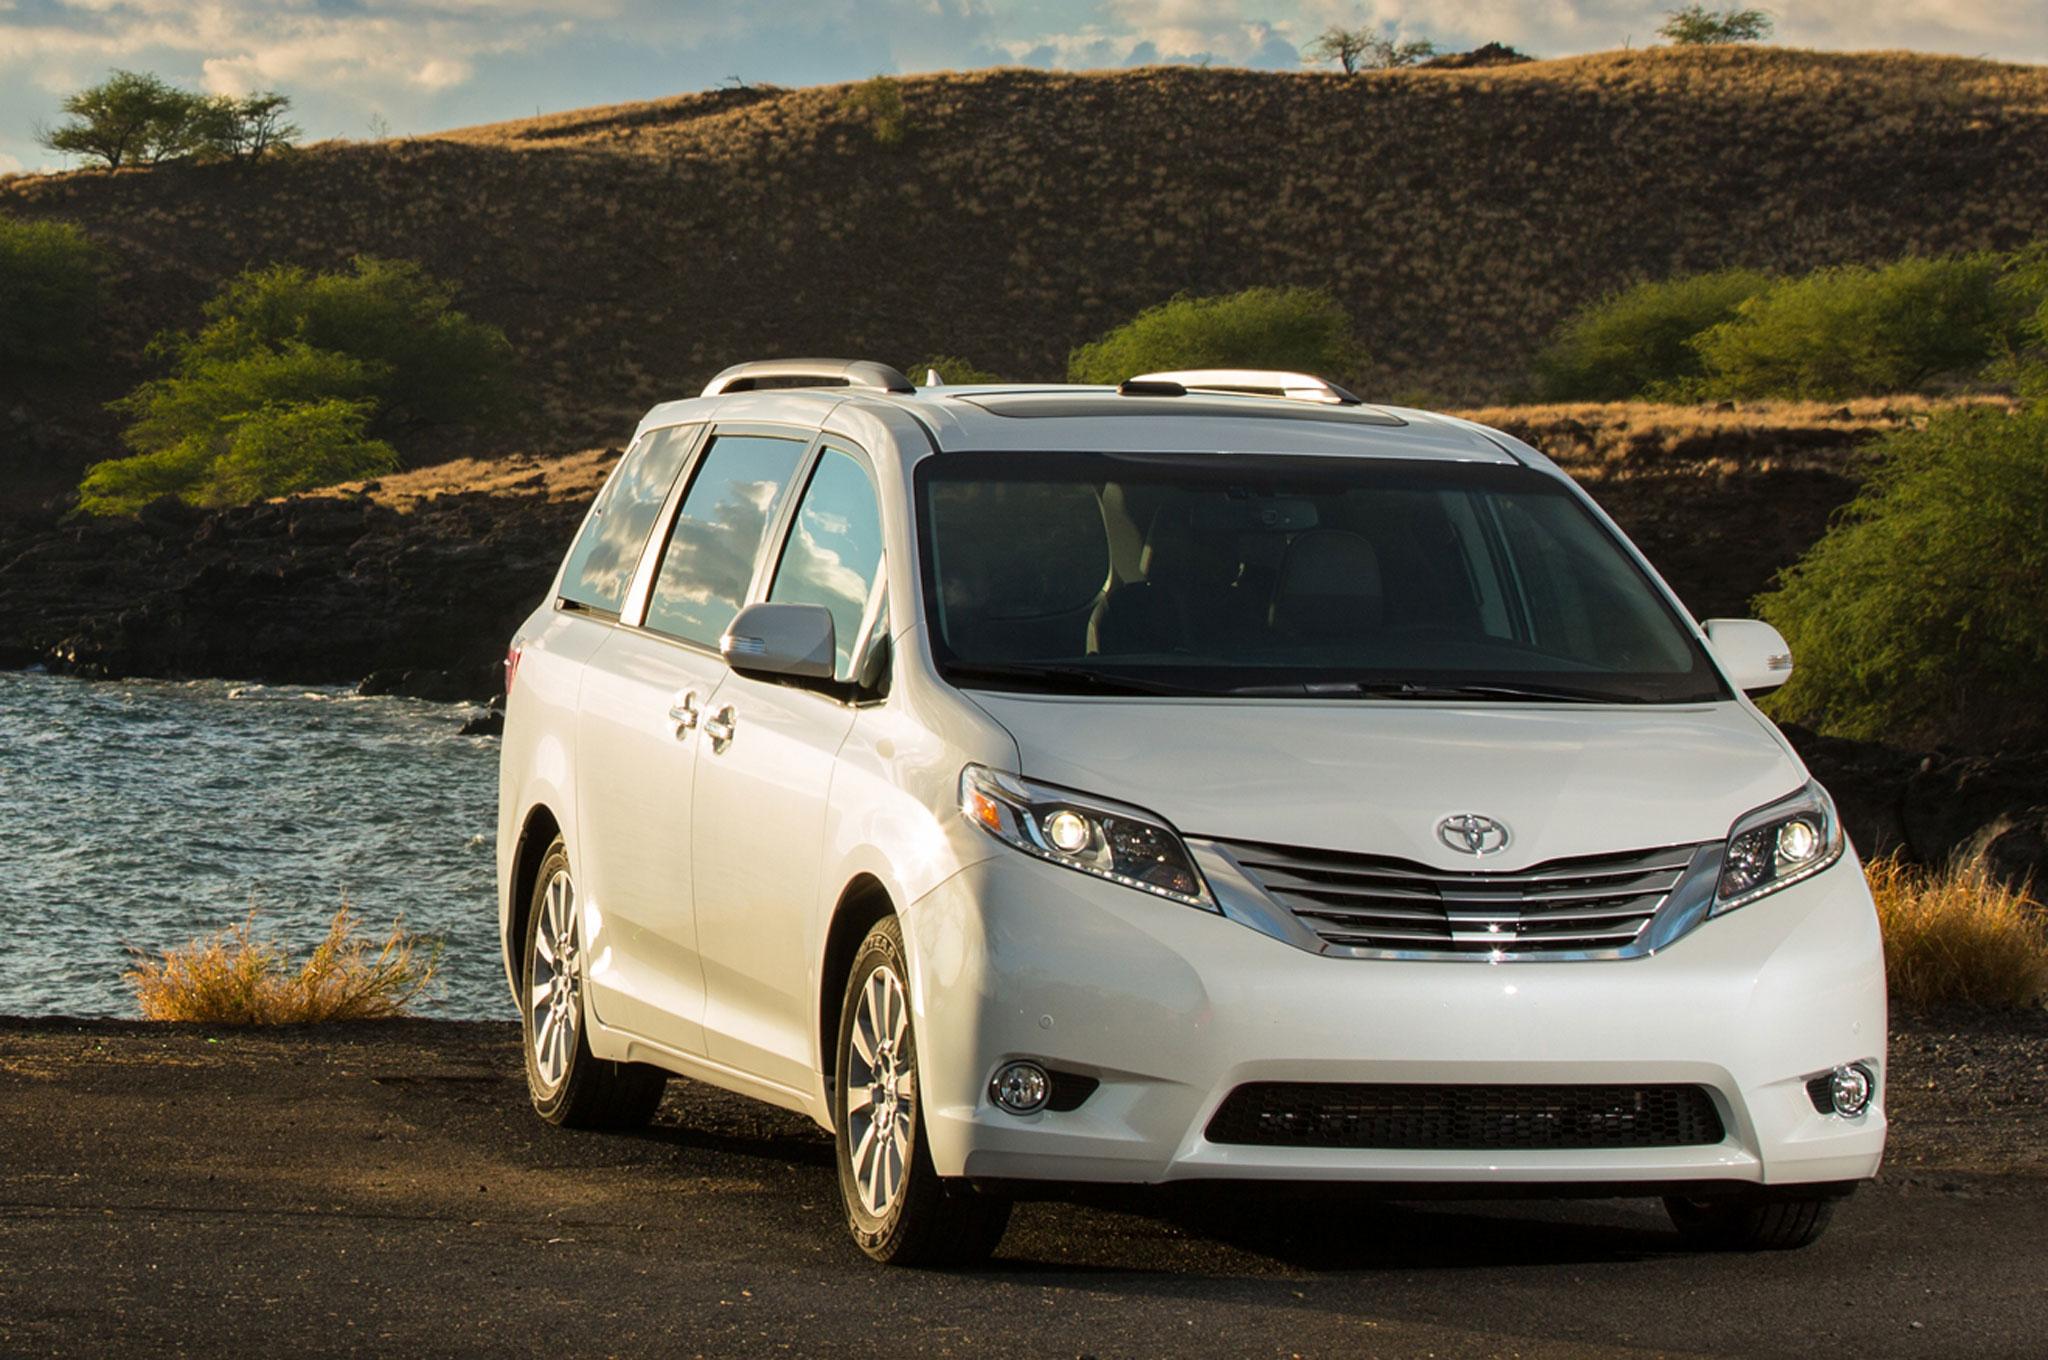 toyota news information conceptcarz com and sienna minivan